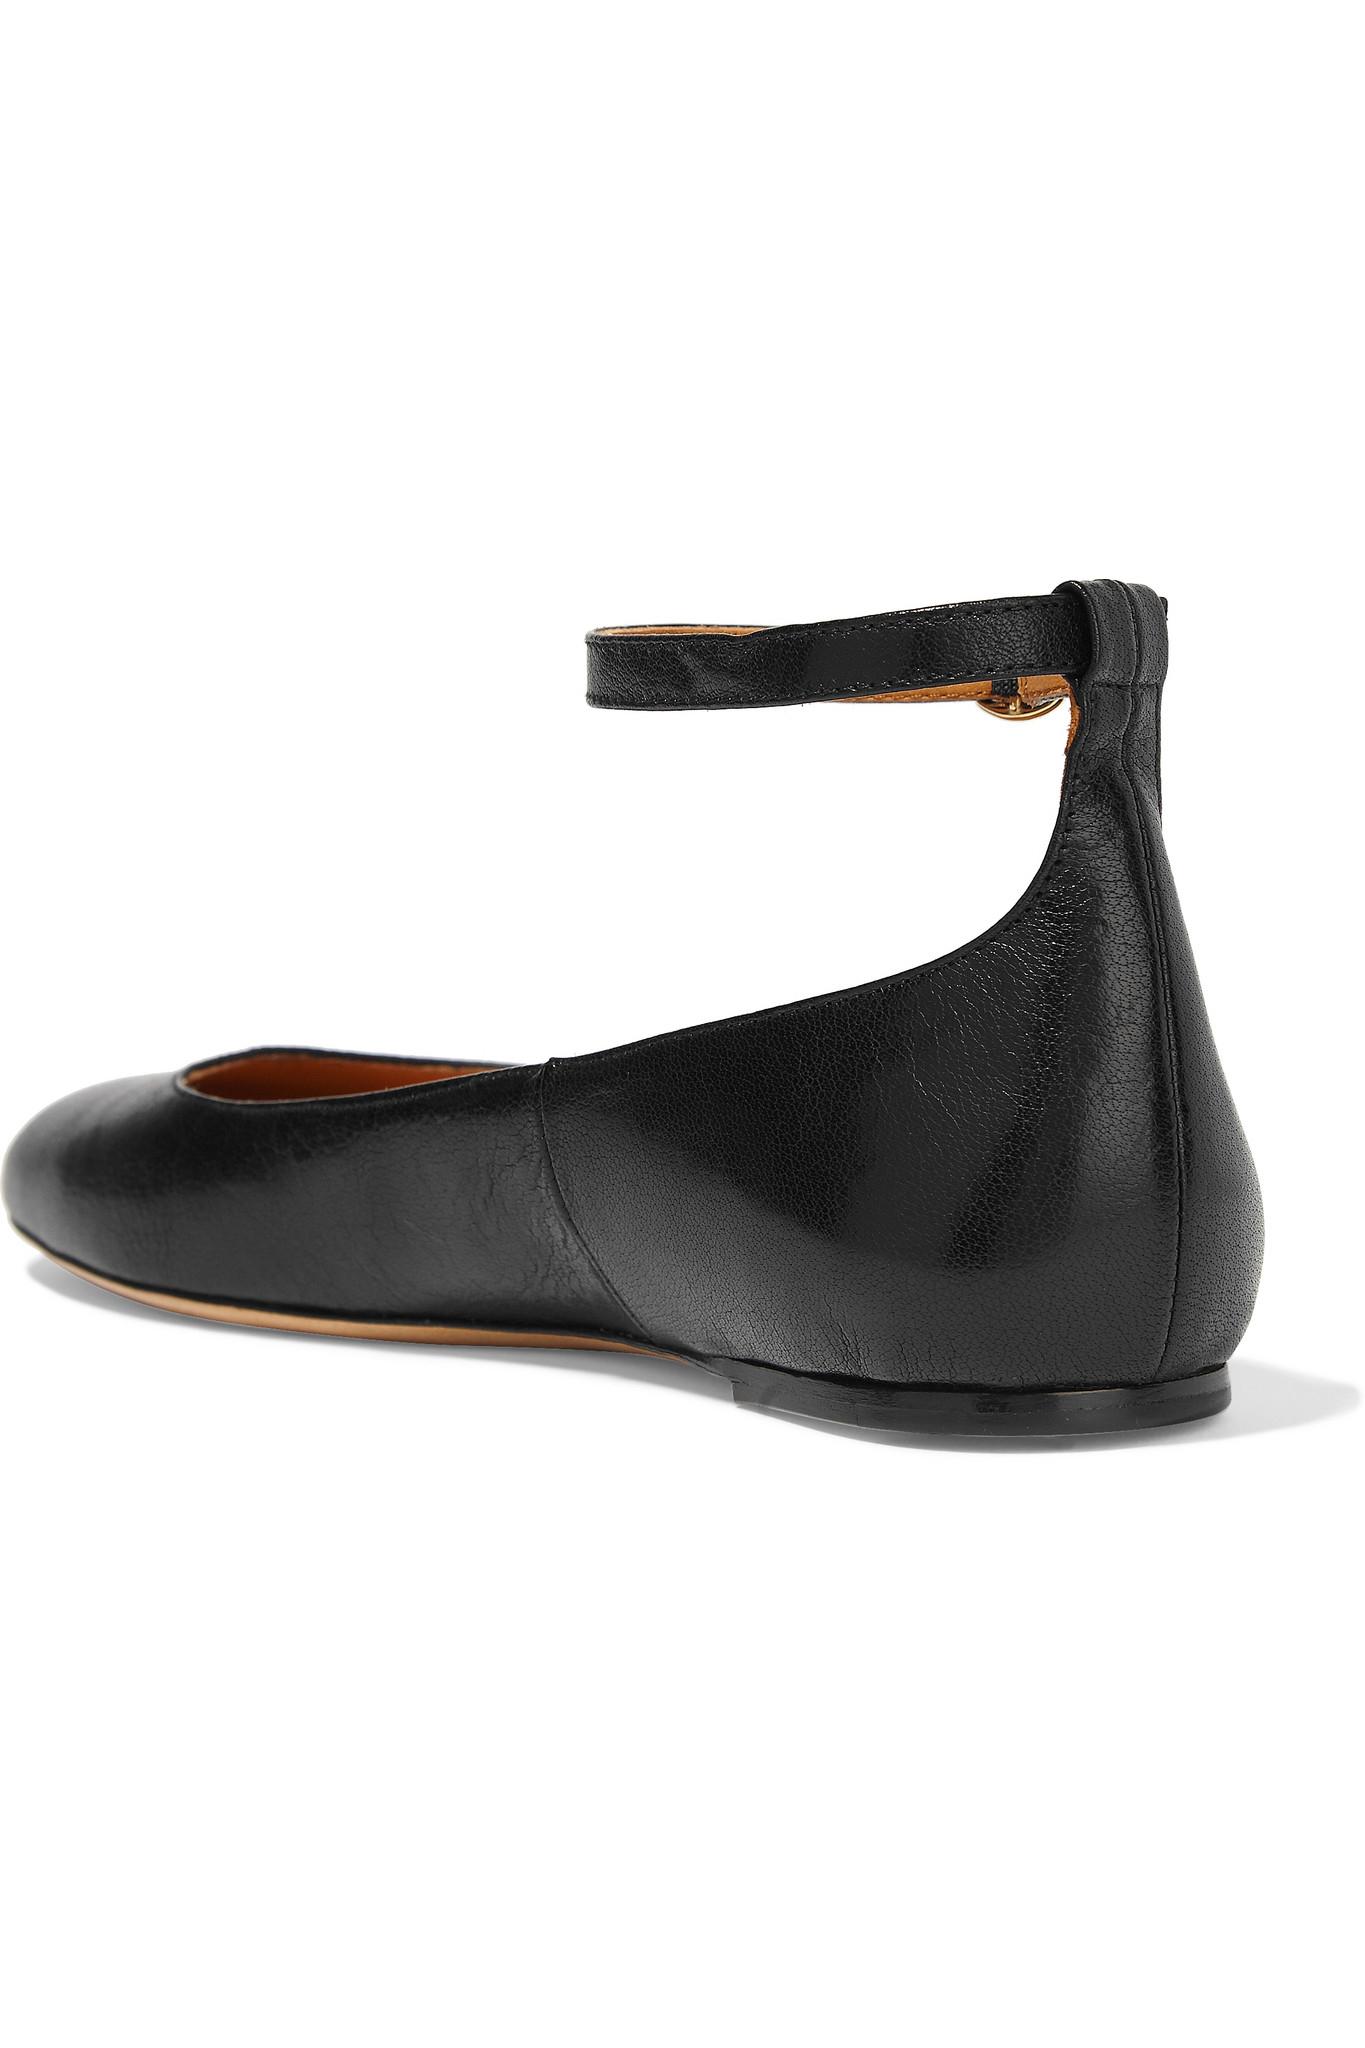 3ca67fa2b0212 Isabel Marant Étoile Lili Leather Ballet Flats in Black - Lyst